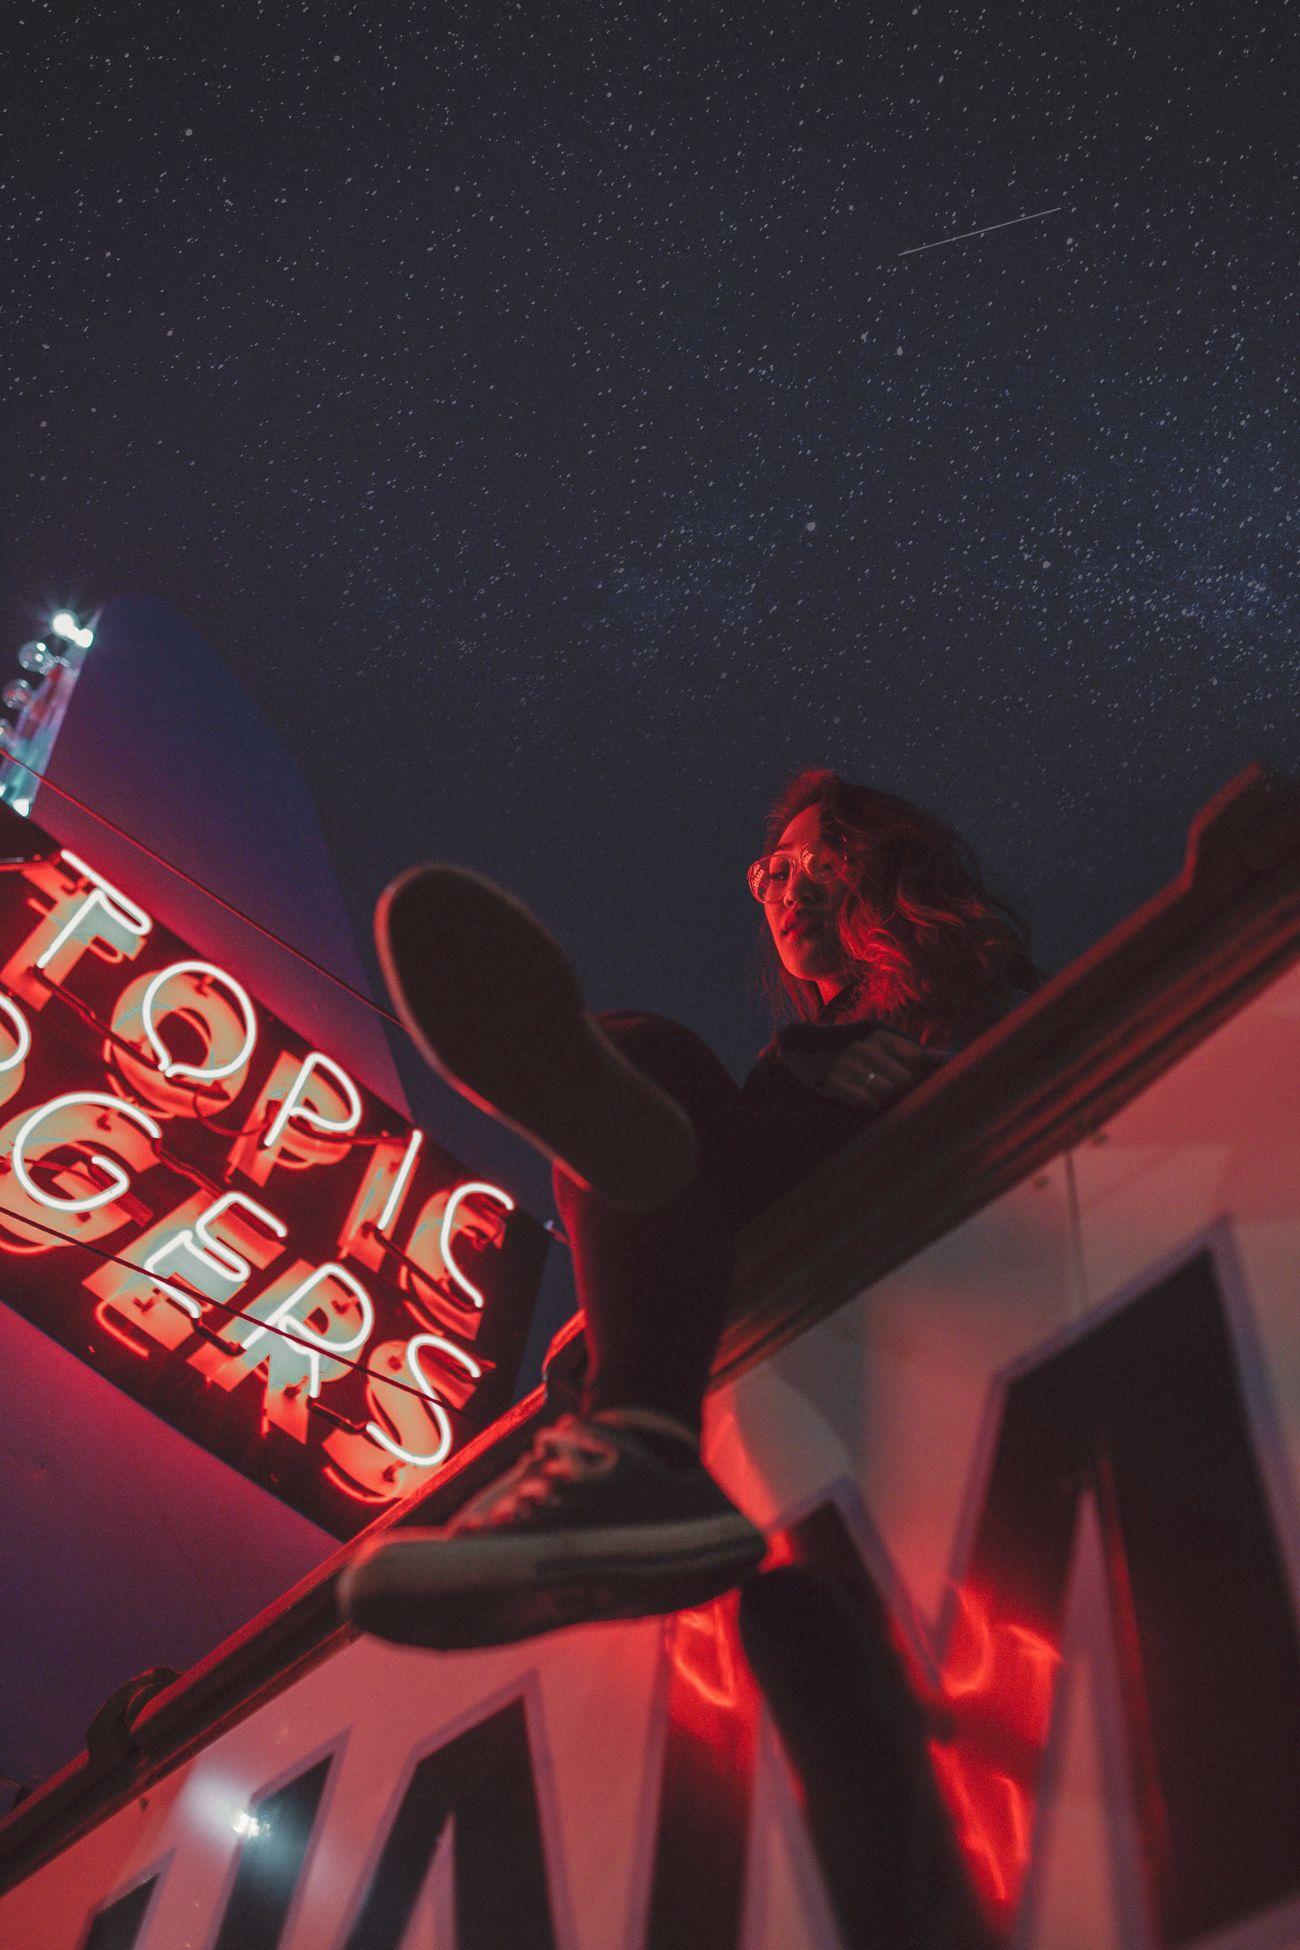 night, low angle view, communication, illuminated, real people